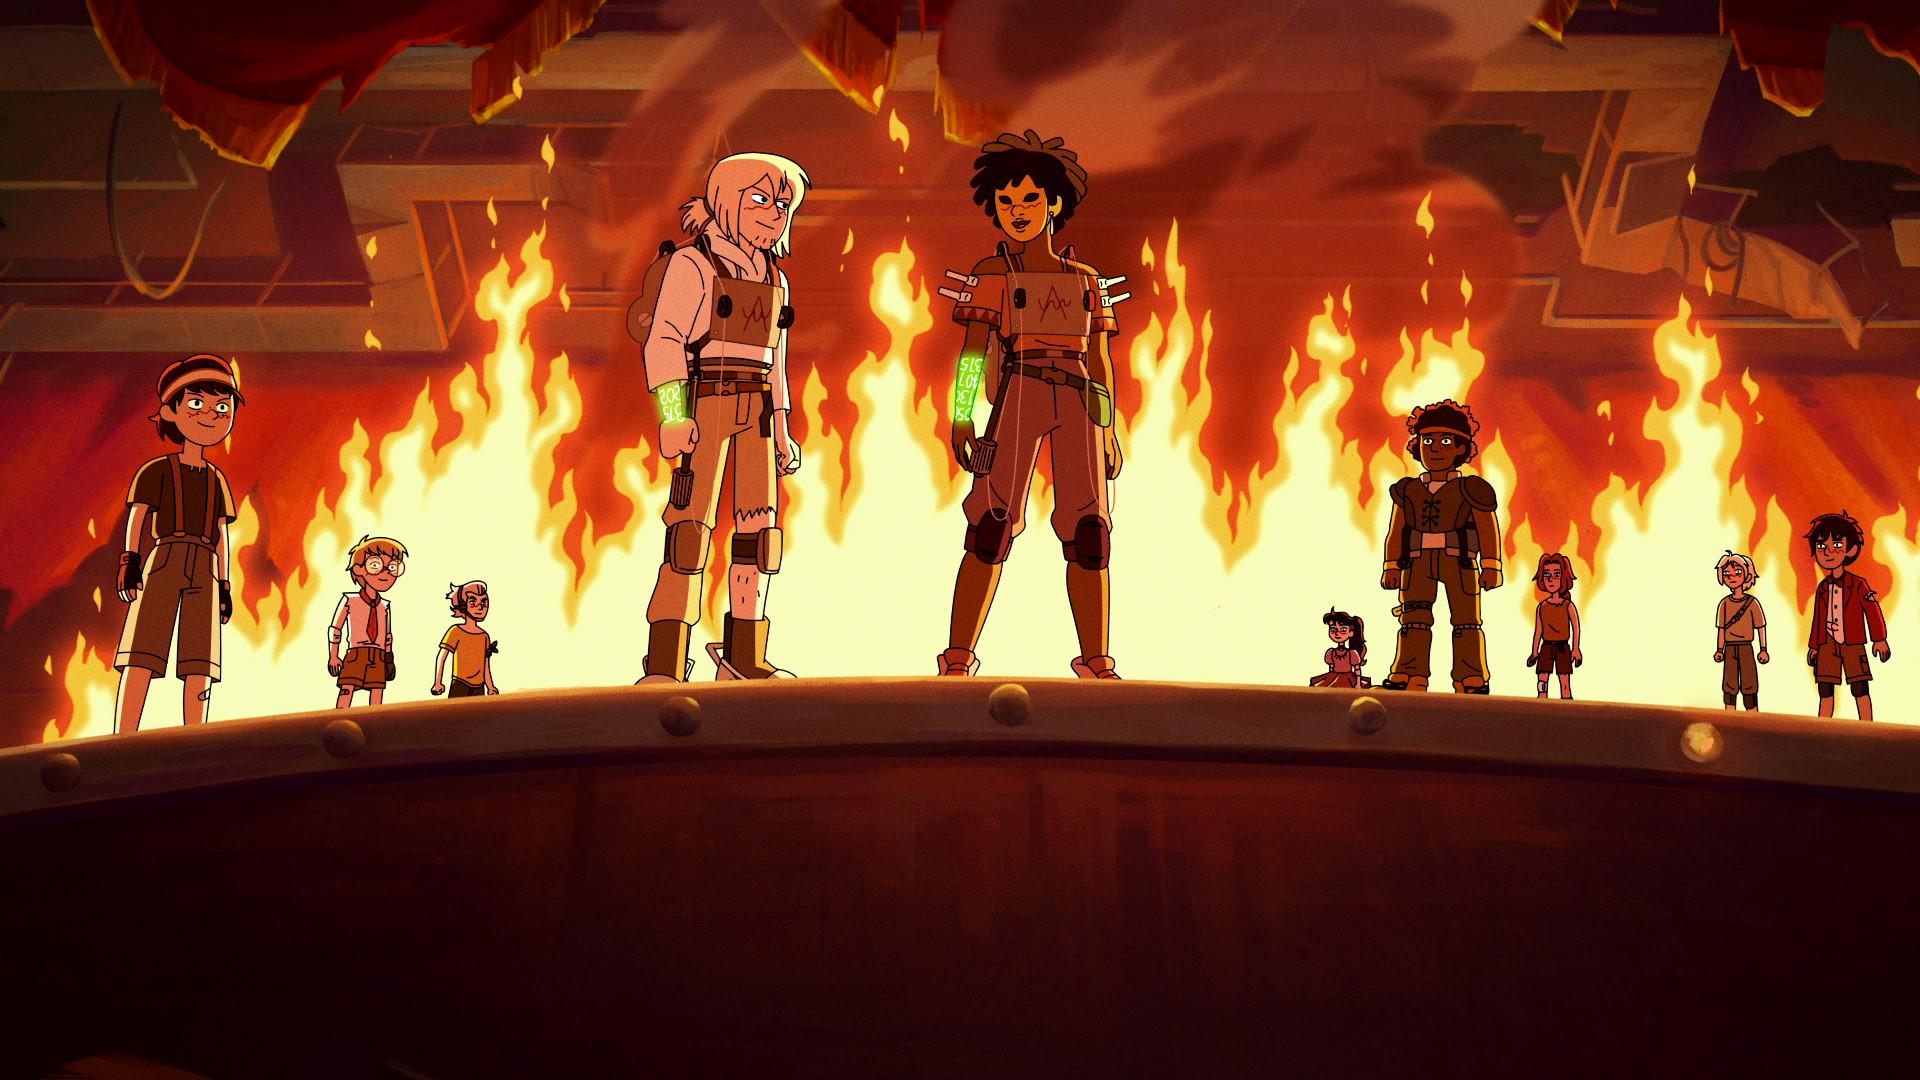 Gremlins, Craig of the Creek, Infinity Train, Jade Armor, Ben 10: HBO Max annonce des plans de programmation animés